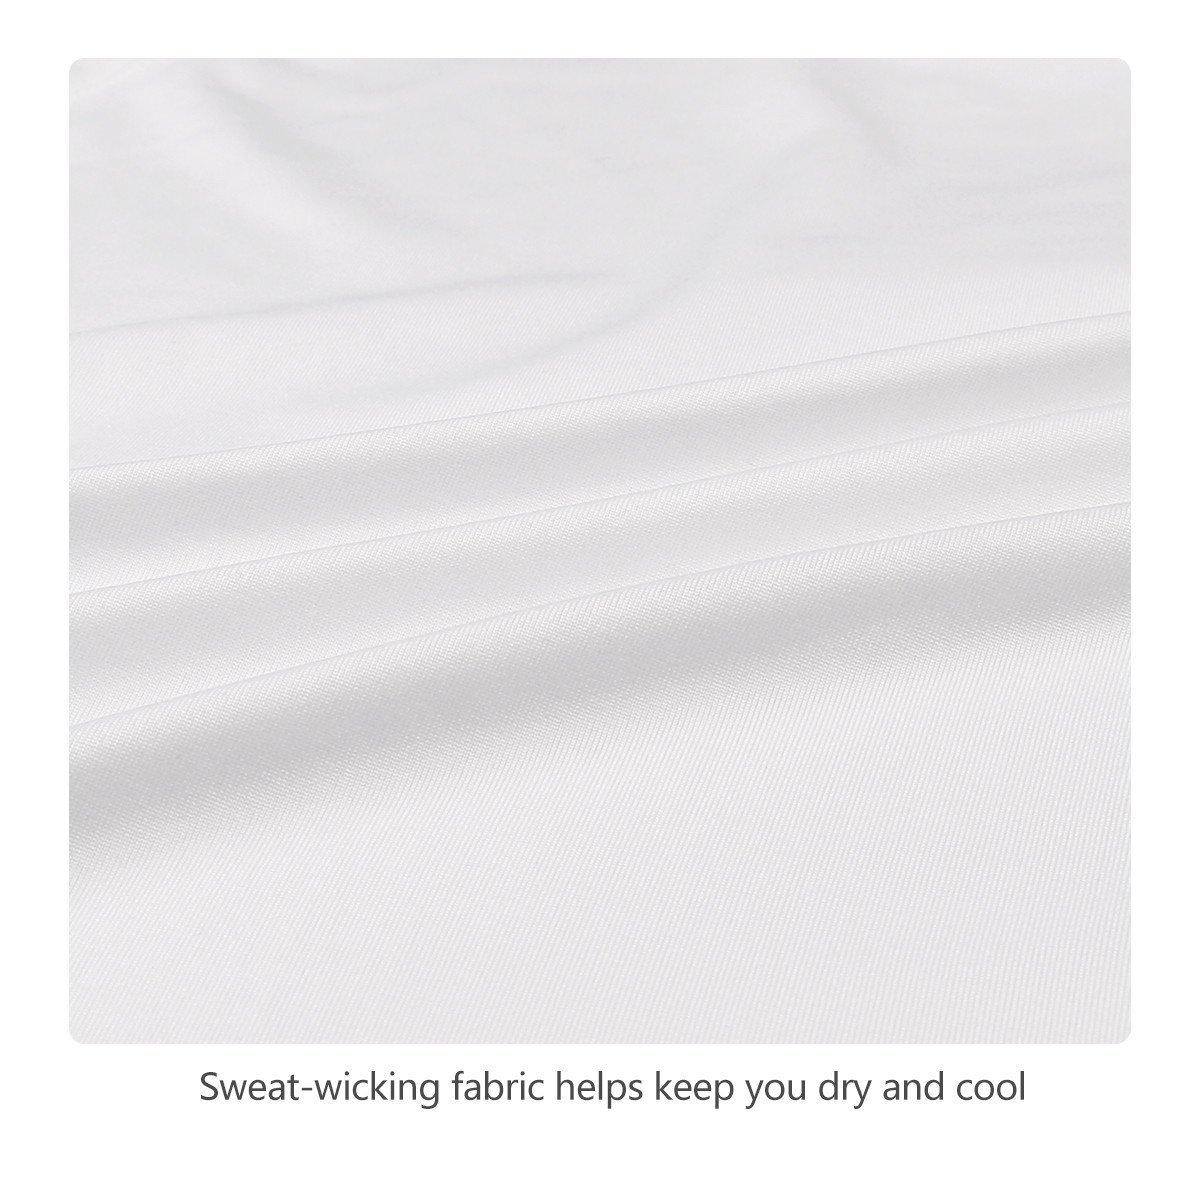 Baleaf Men's Quick Dry Short Sleeve T-Shirt Running Fitness Shirts White Size M by Baleaf (Image #4)